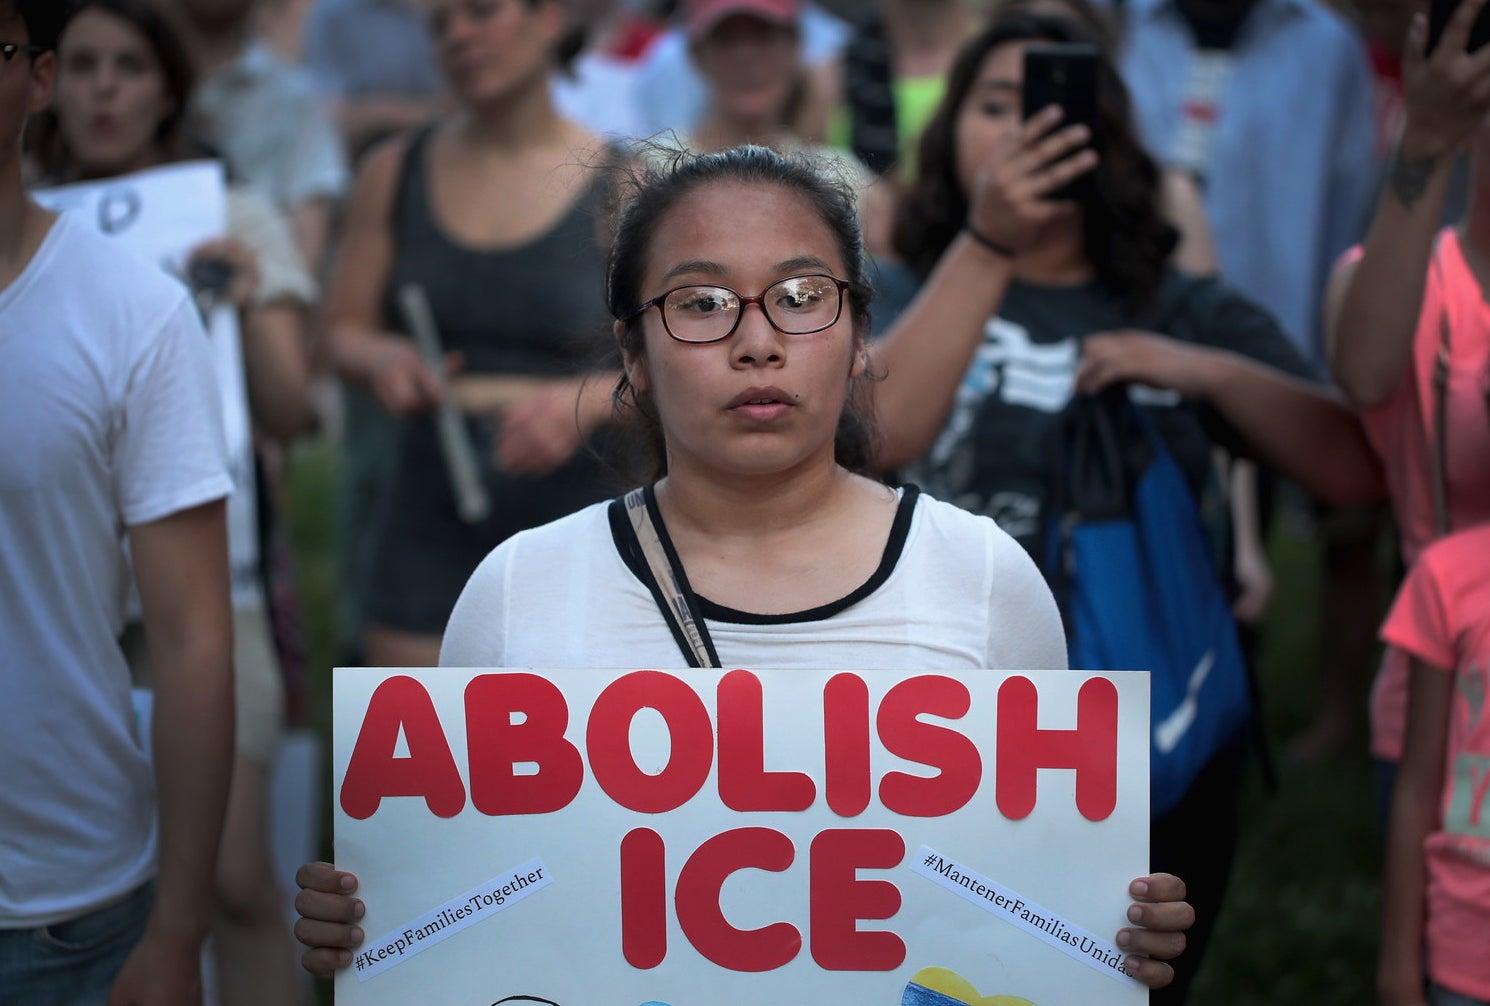 Demonstrators on June 29 in Chicago.